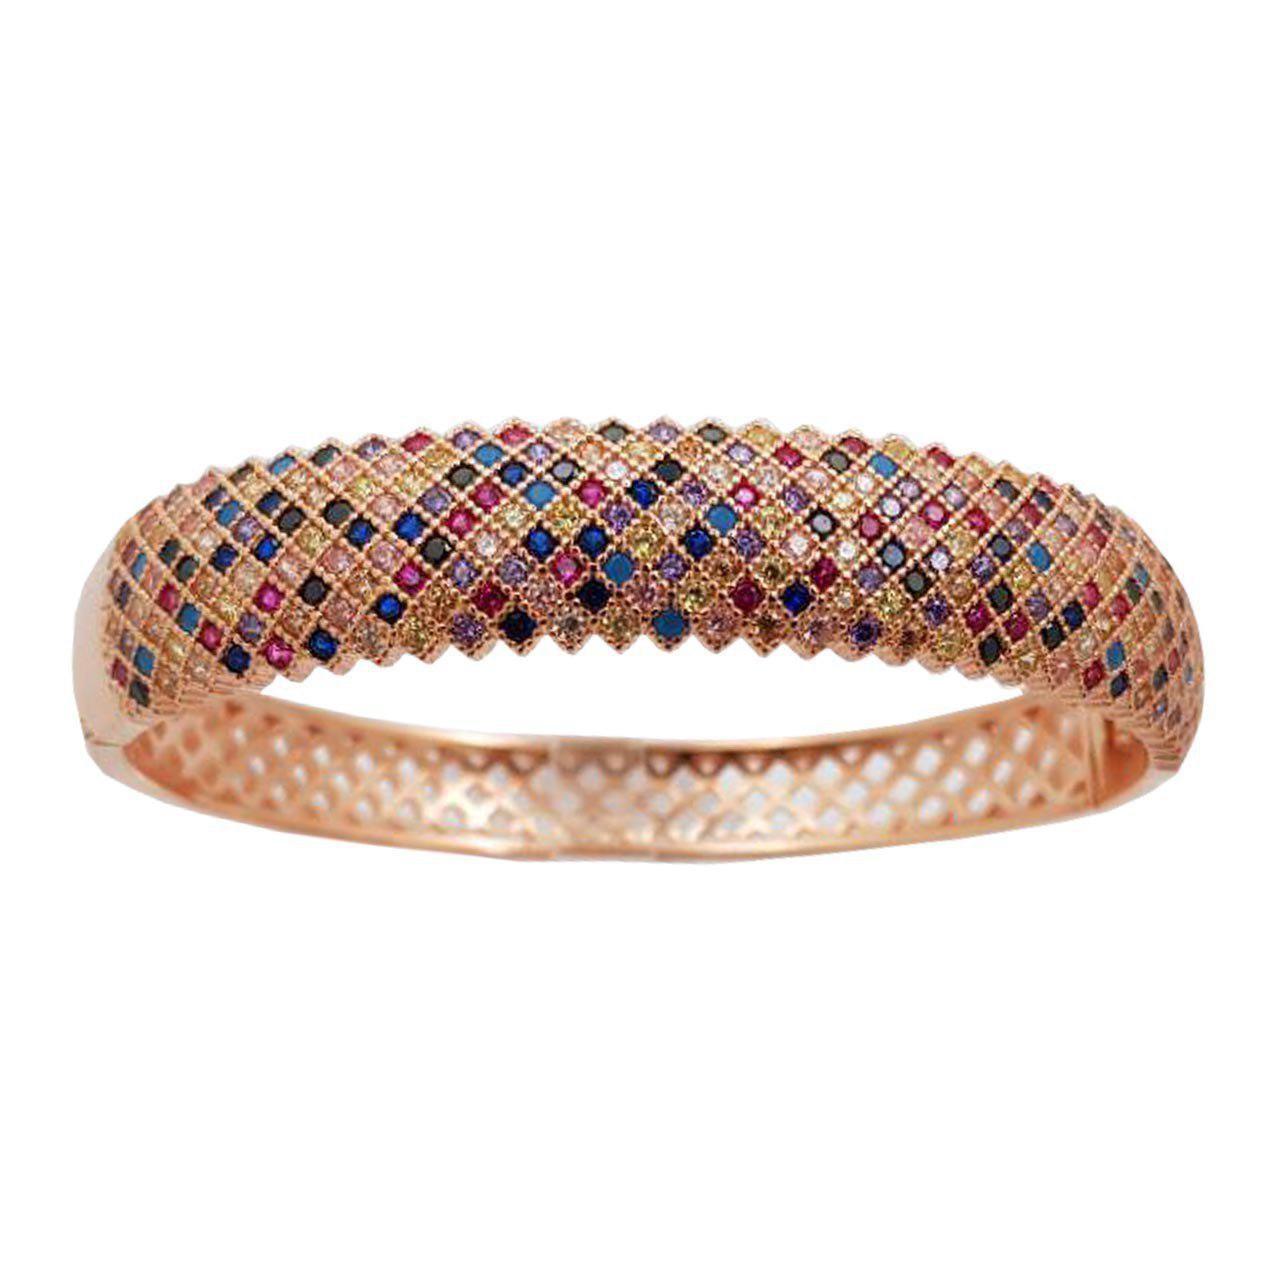 دستبند النگویی نقره ترمه مدل پرنس سنگ رنگی Termeh 22